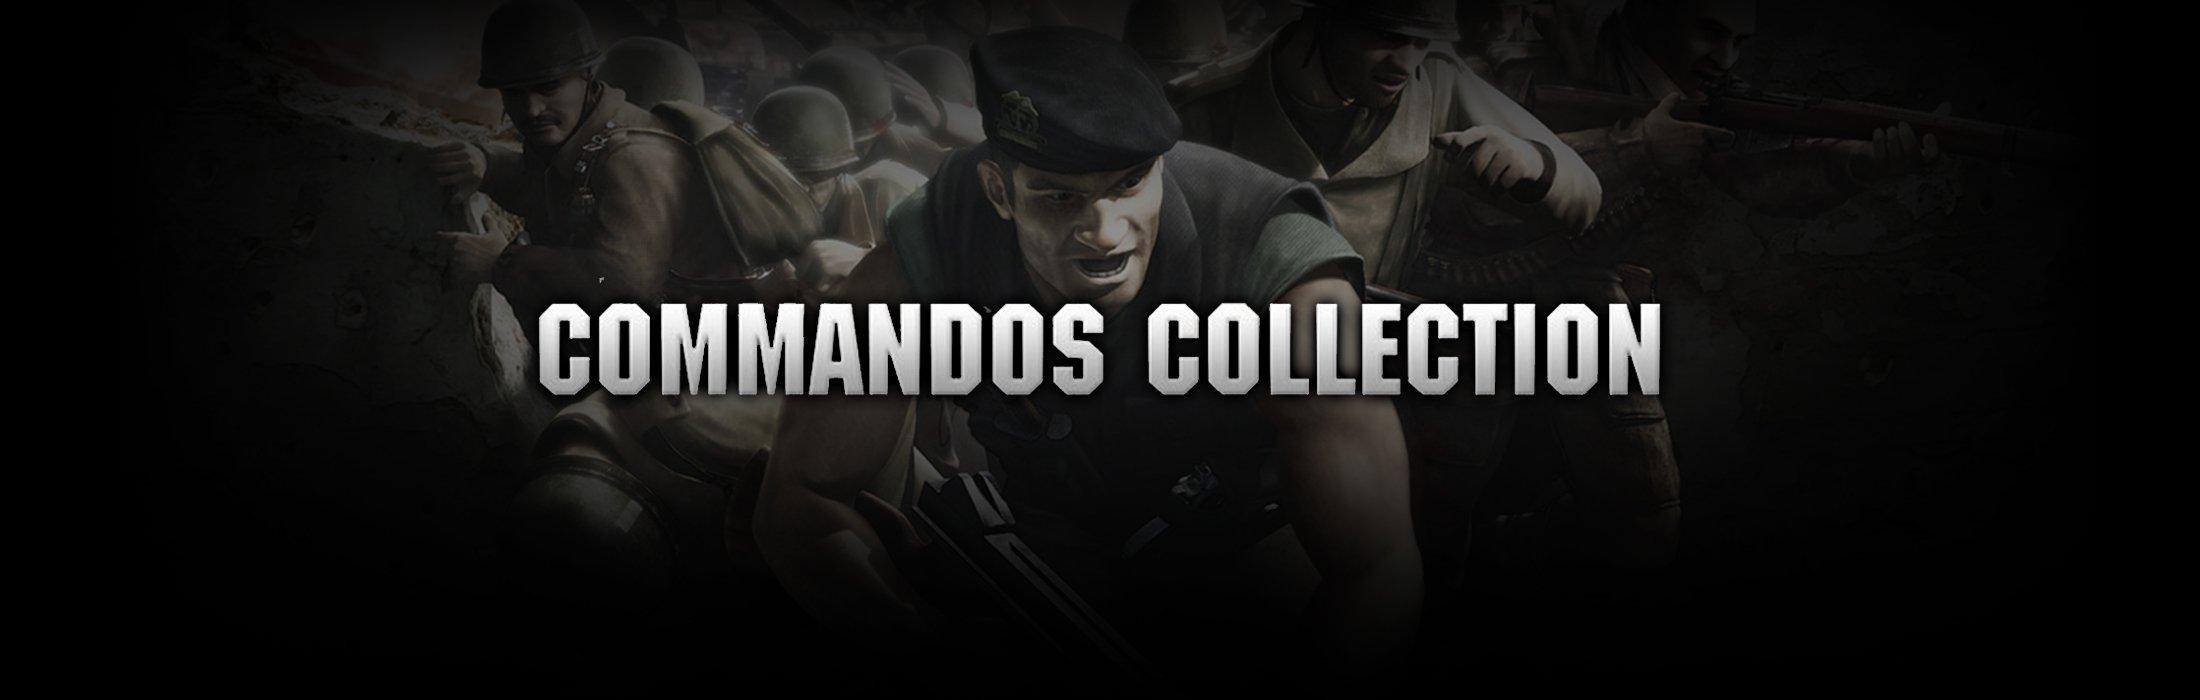 Commandos Collection (PC Digital Download) $0.79